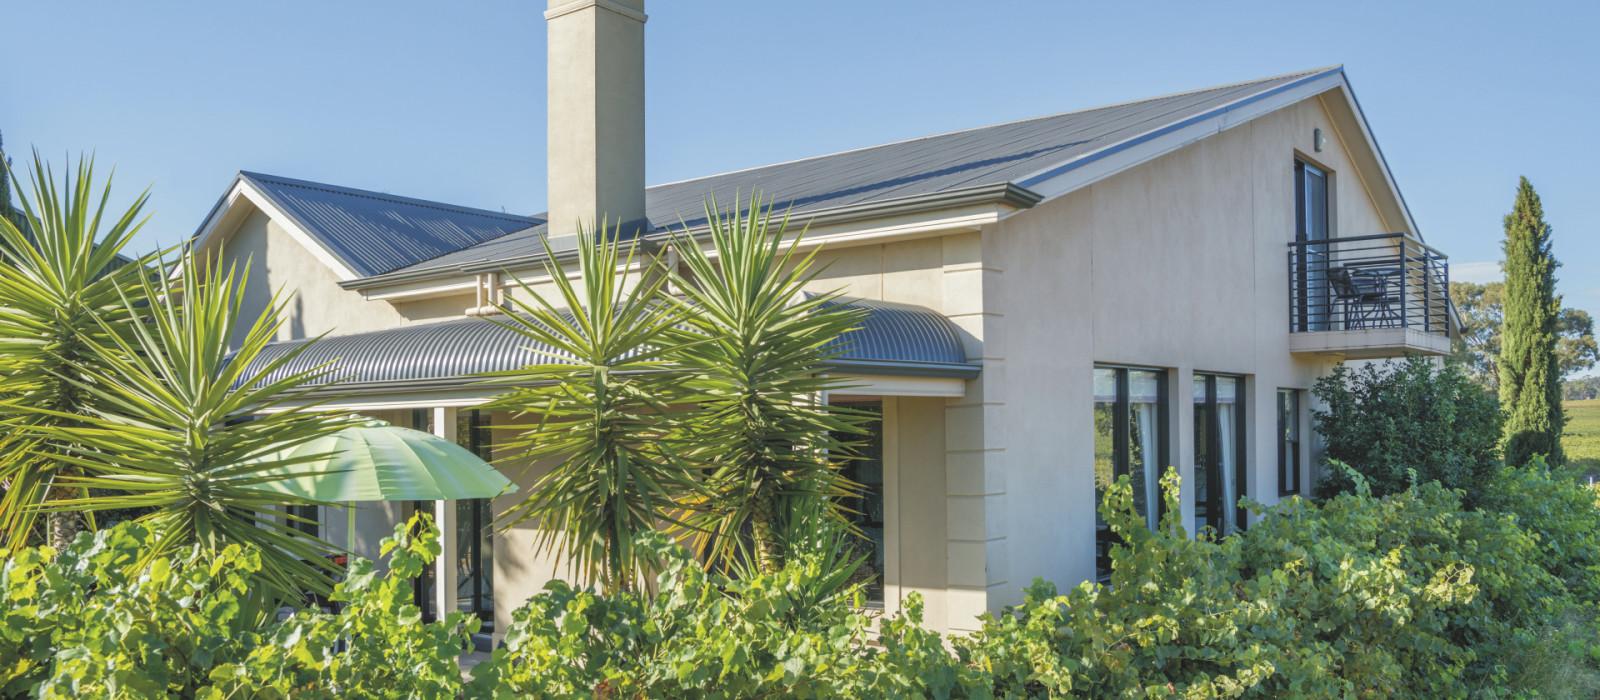 Hotel Barossa Shiraz Estate Australien